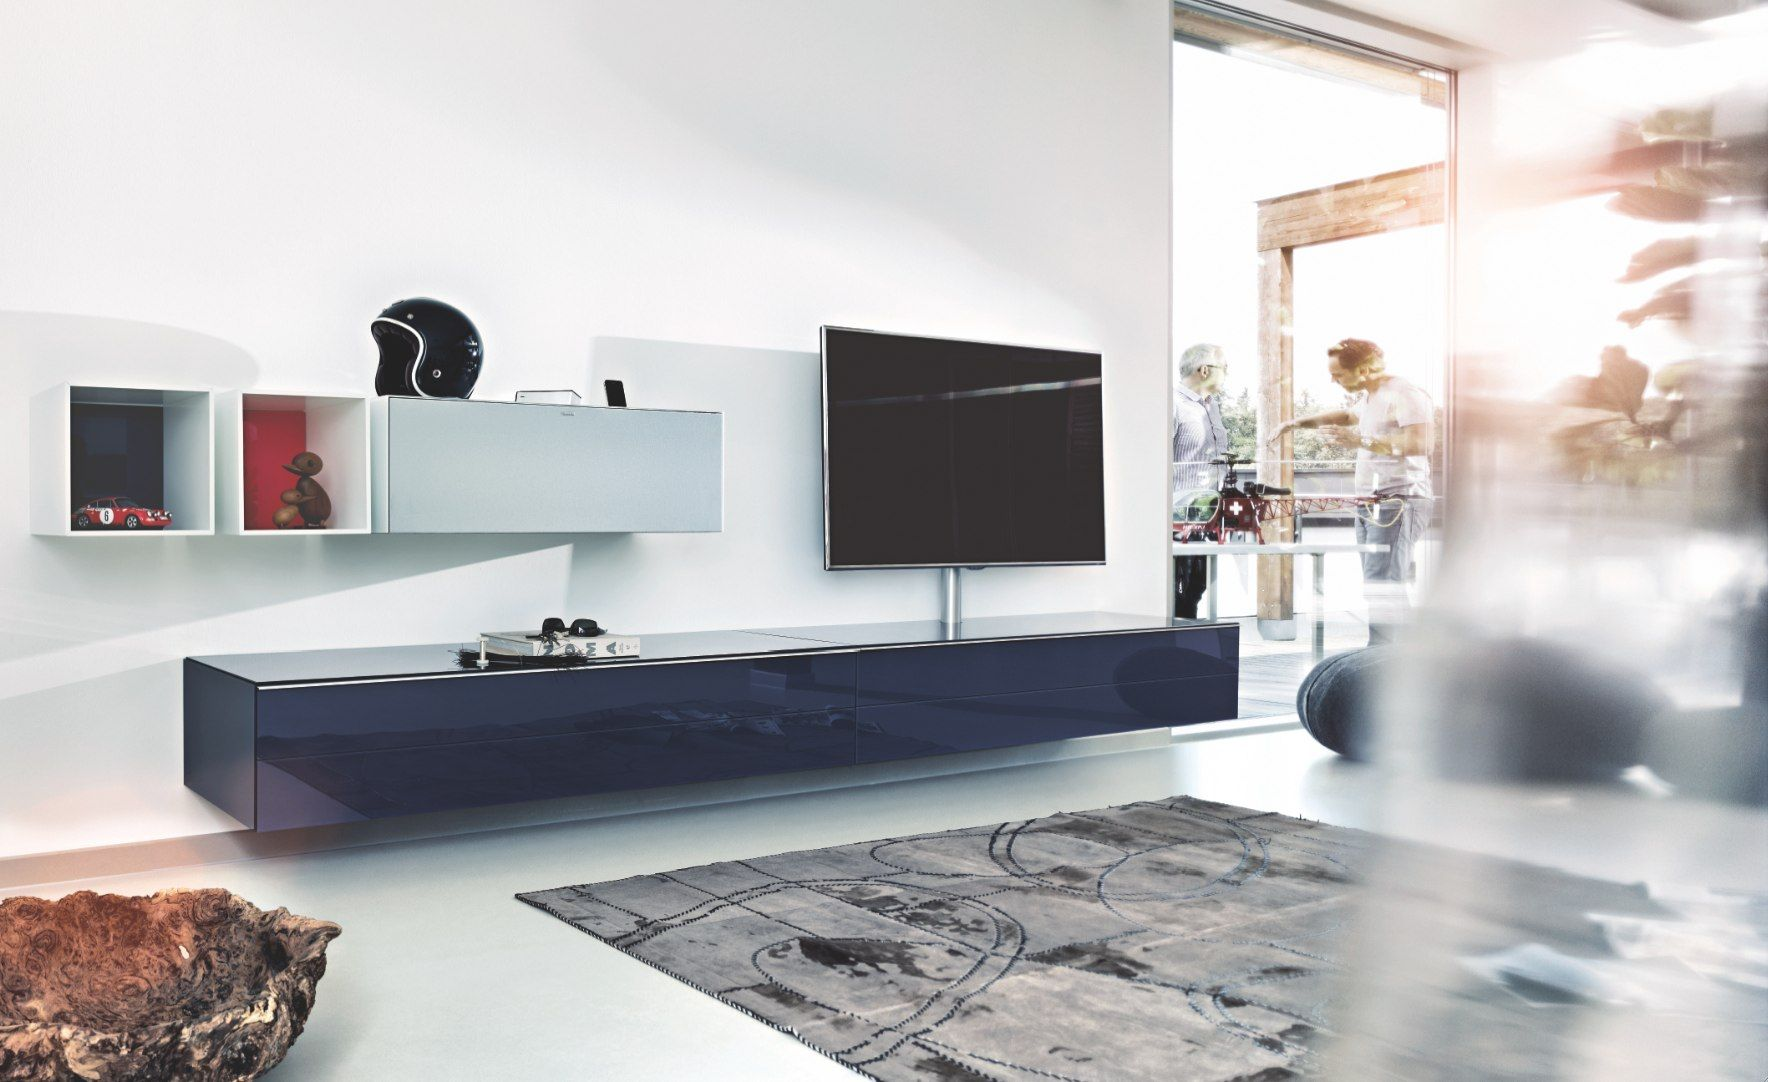 Spectral Scala @Top Interieur | Eetkamers, kasten, (salon)tafels en ...